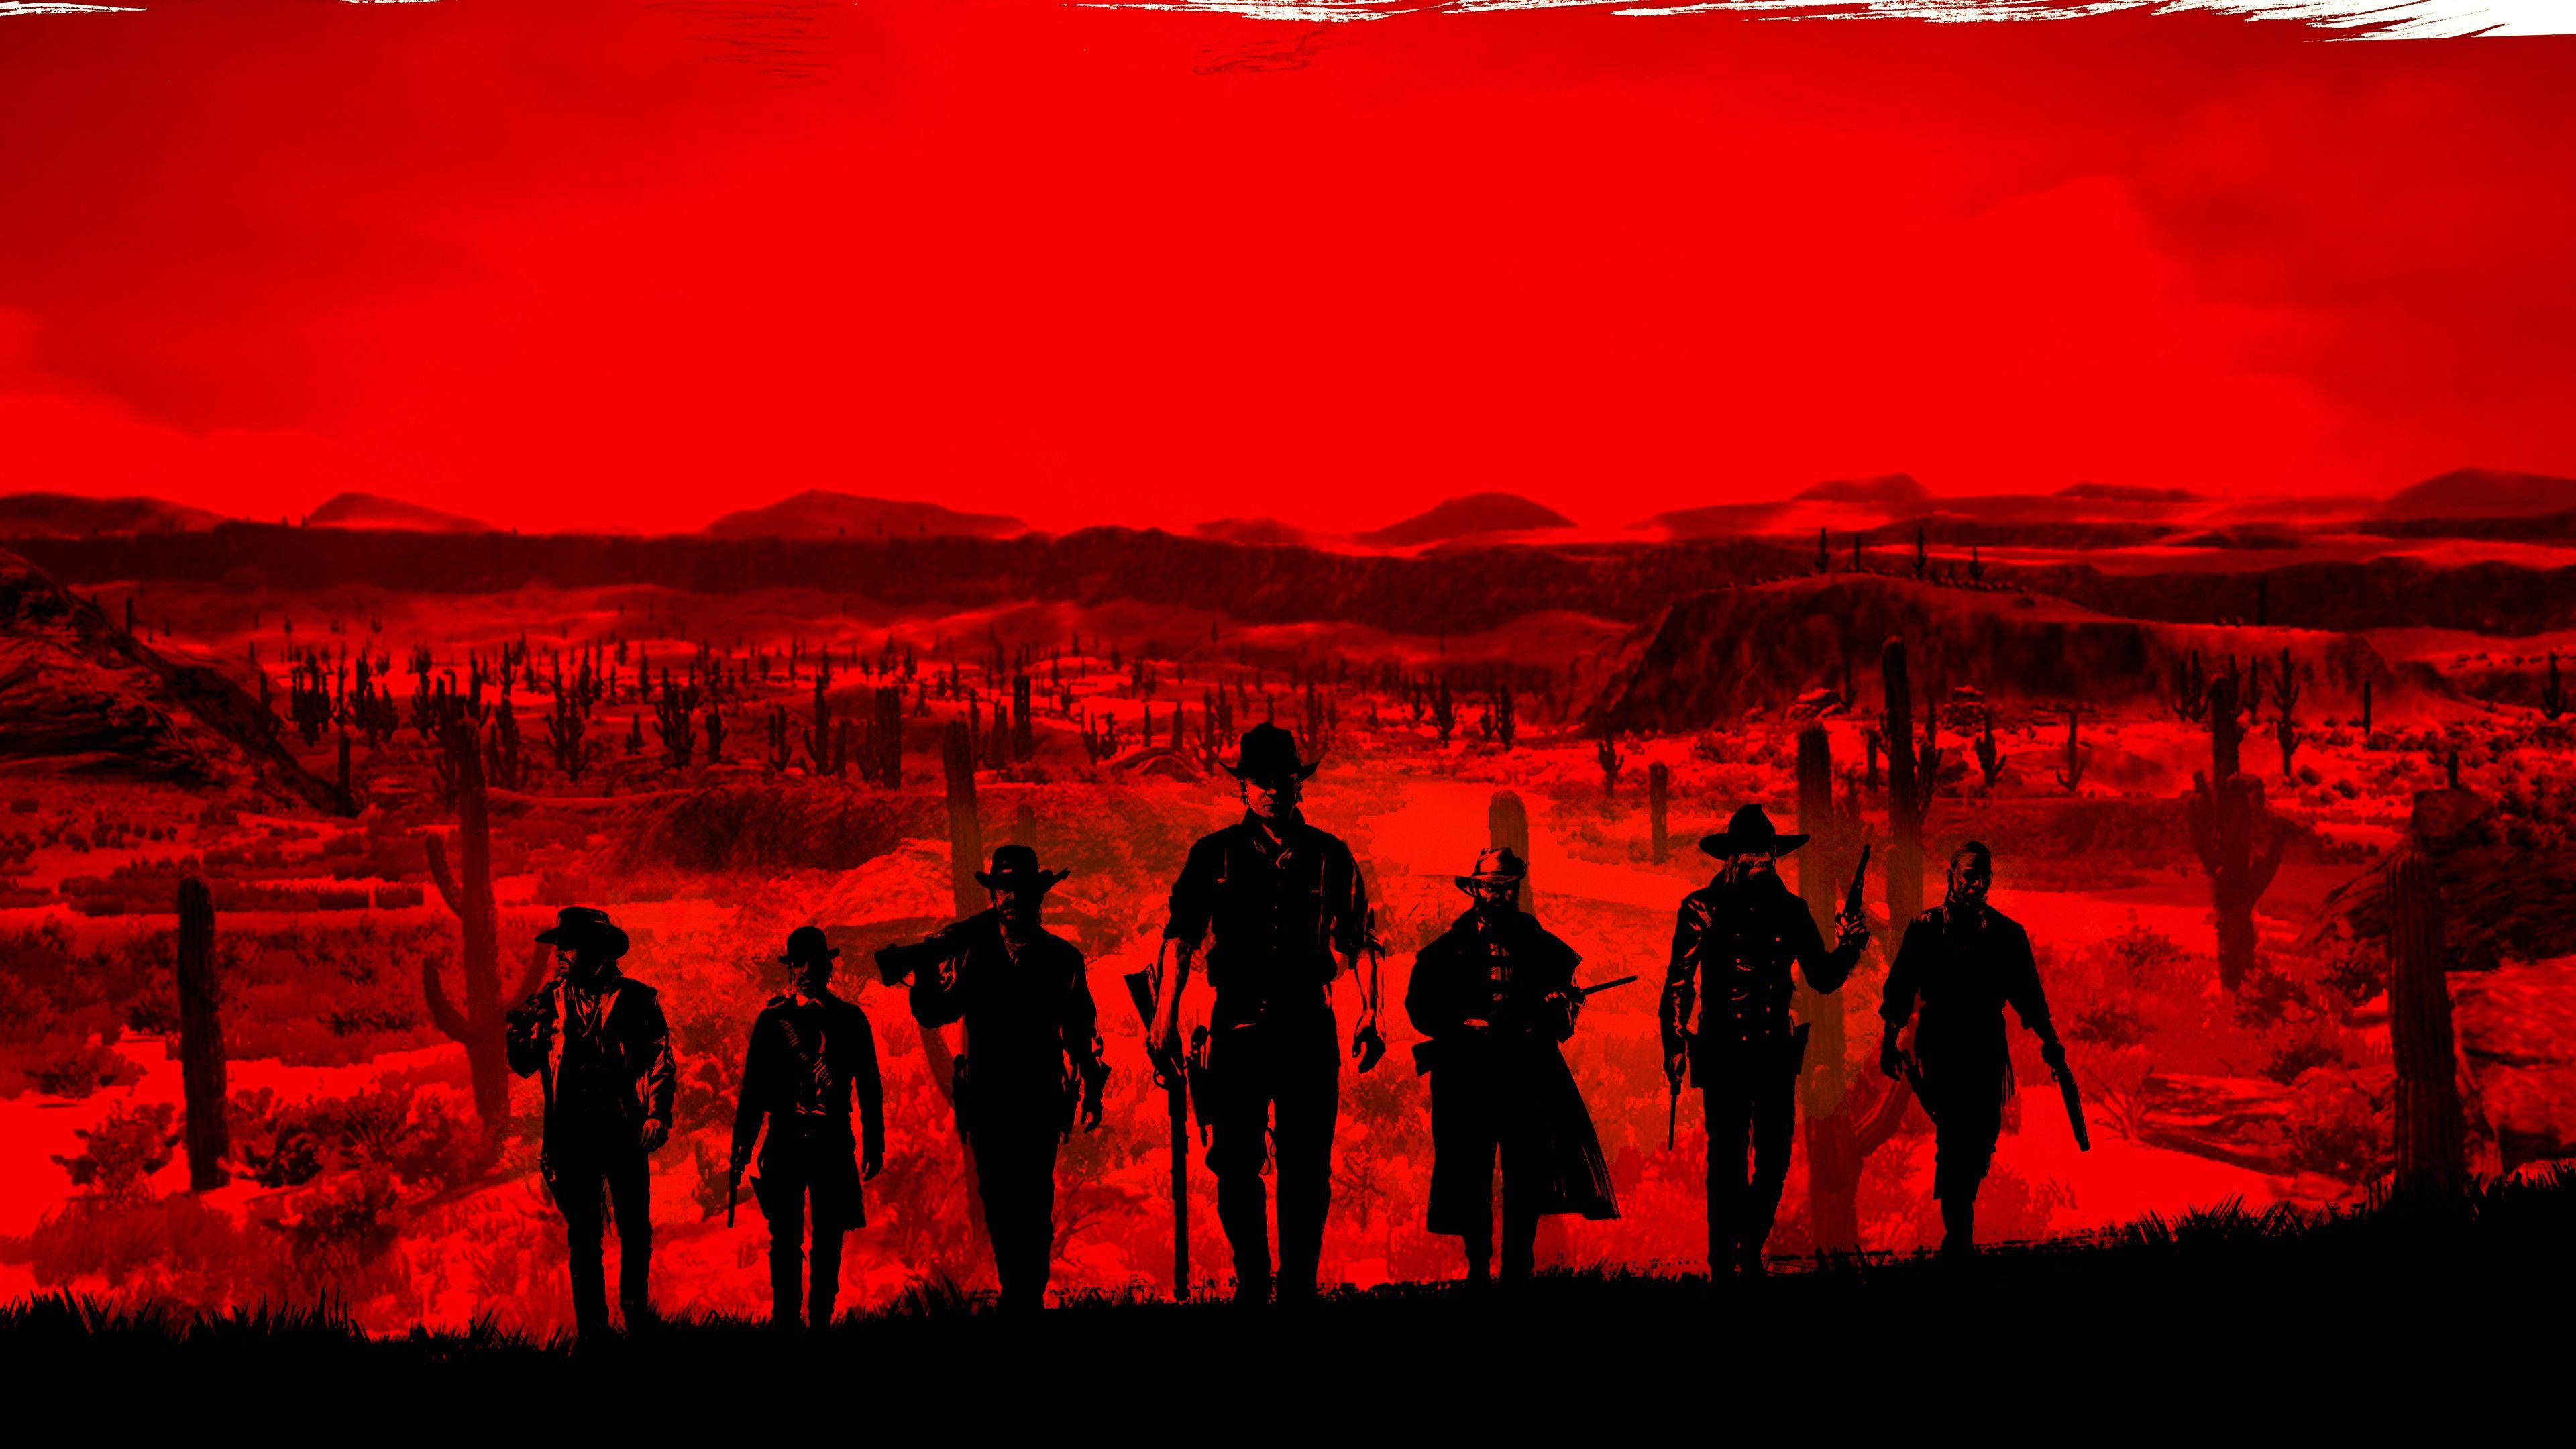 Red Dead Redemption 2 4k Wallpaper Background Red Dead Redemption Wallpaper Backgrounds Wallpaper Pictures